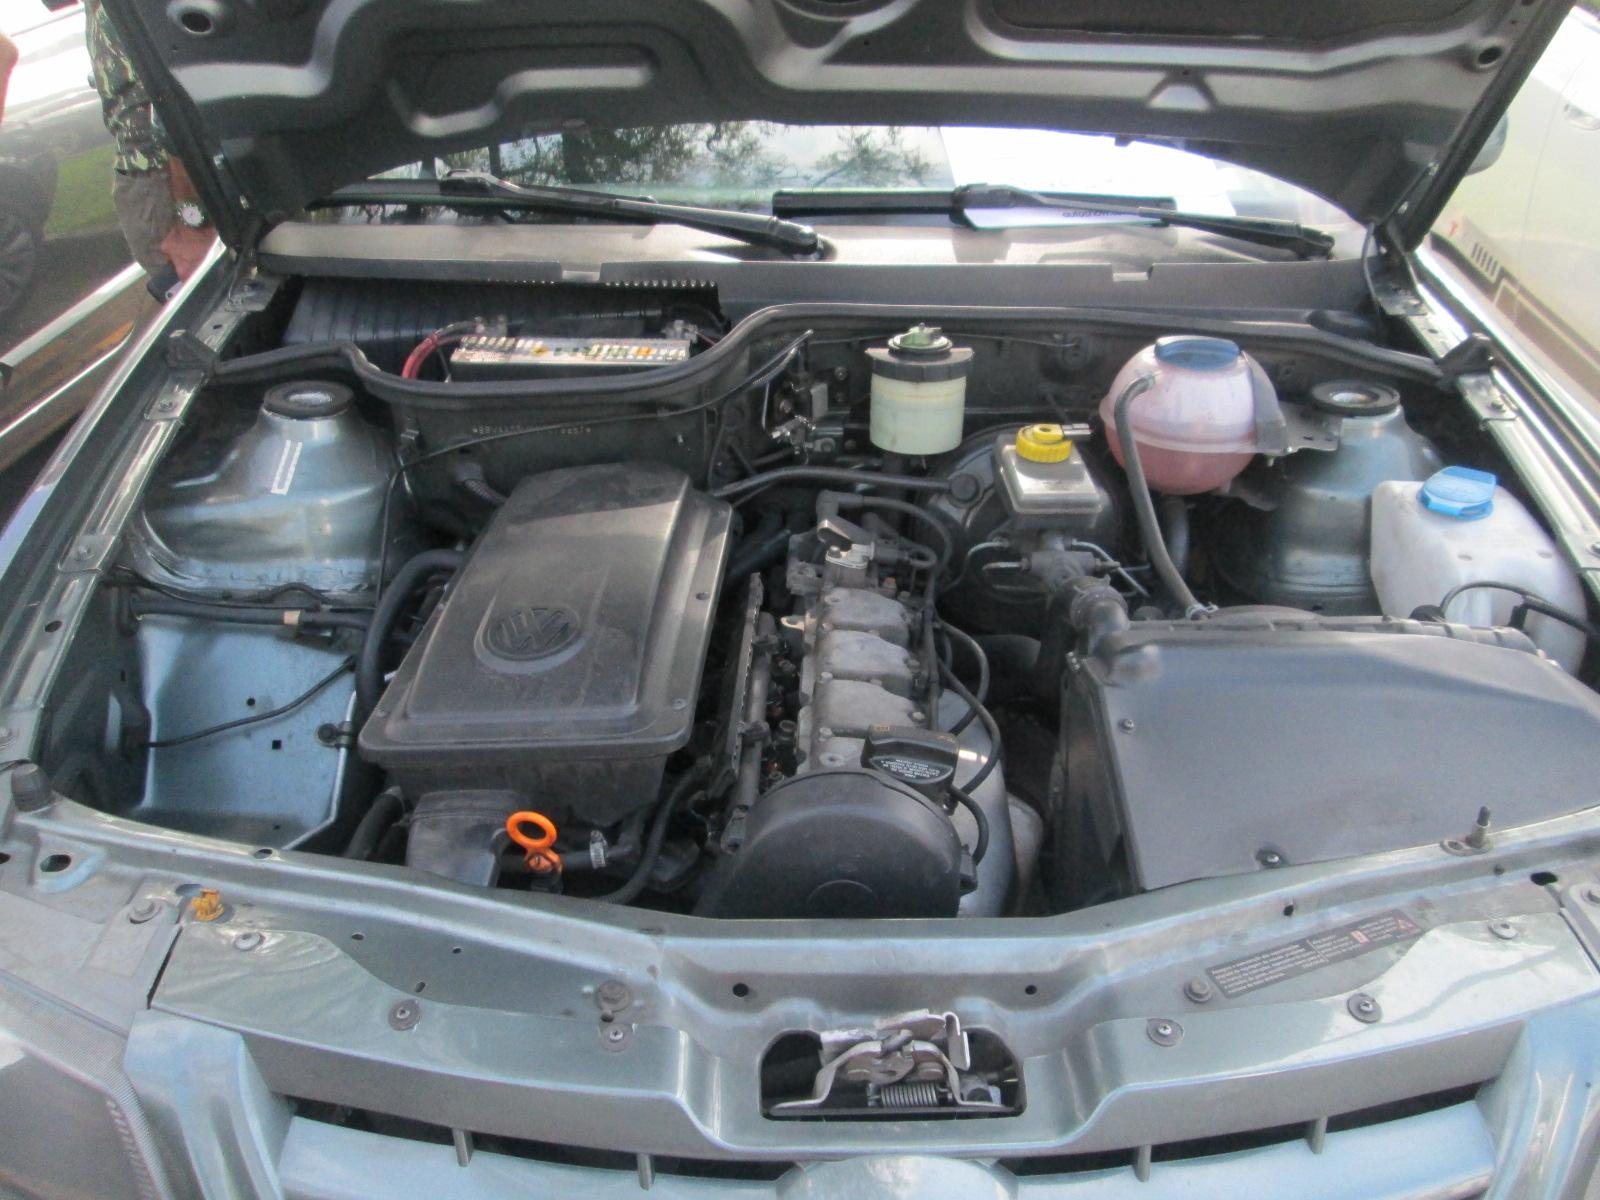 Feirão Auto Show Anhembi - VOLKSWAGEN GOL PLUS 1.0 MI TOTAL FLEX 4P 2008-2009